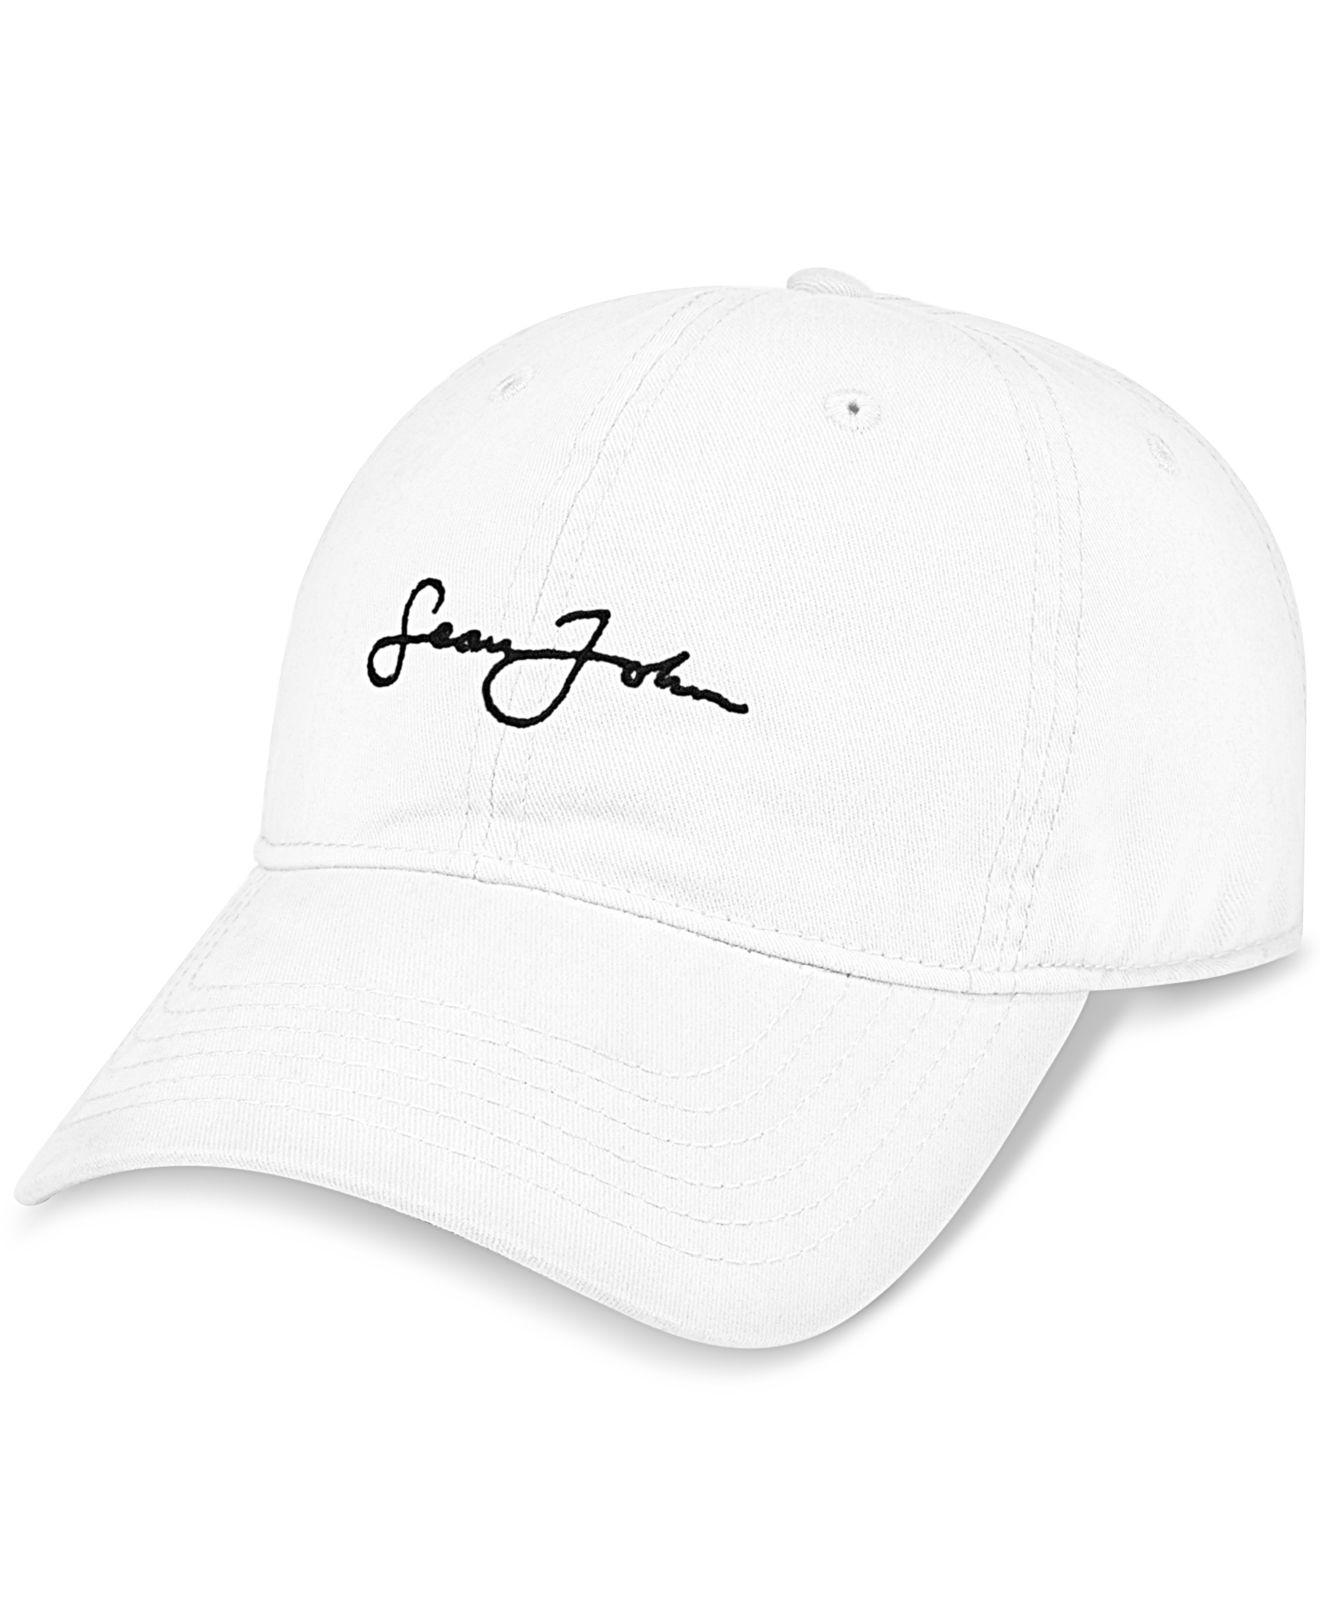 bc486eb6ef7 Lyst - Sean John Men s Textured Cap in White for Men